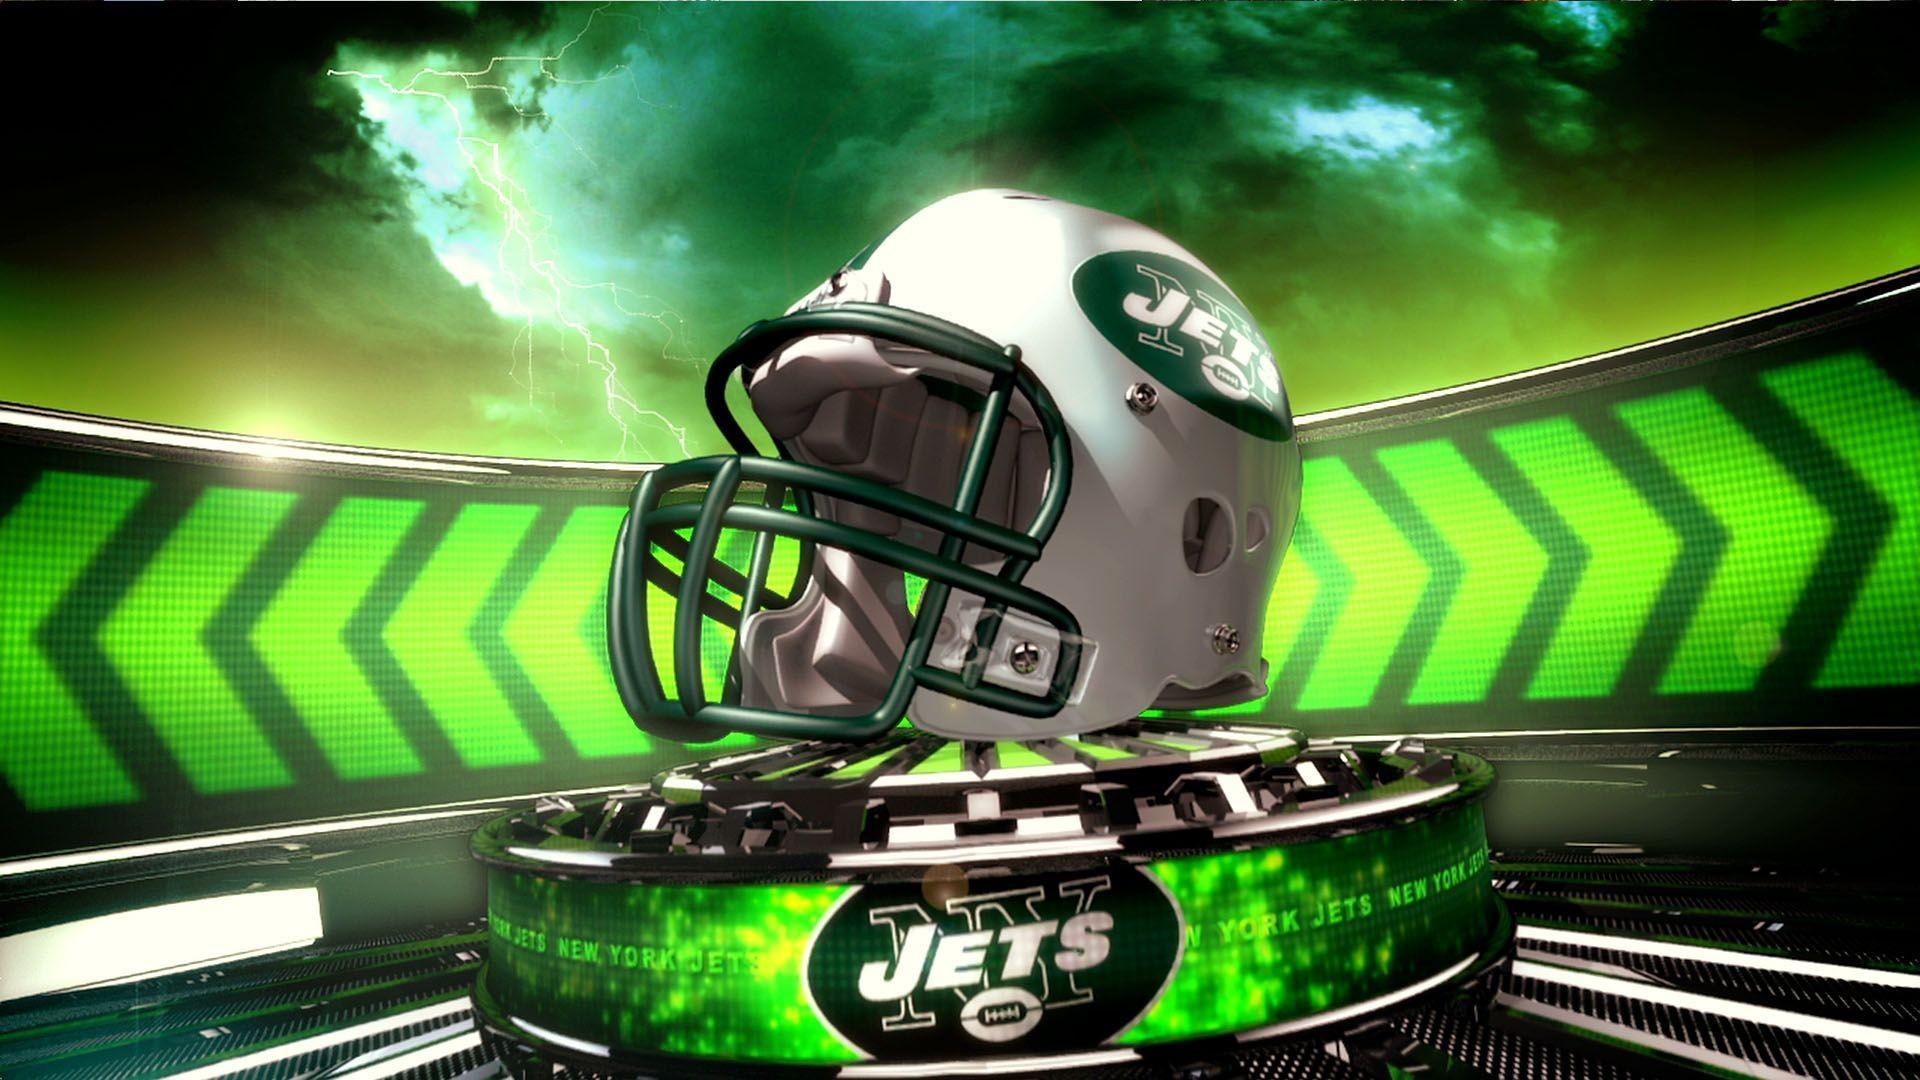 65 New York Jets Wallpaper Iphone